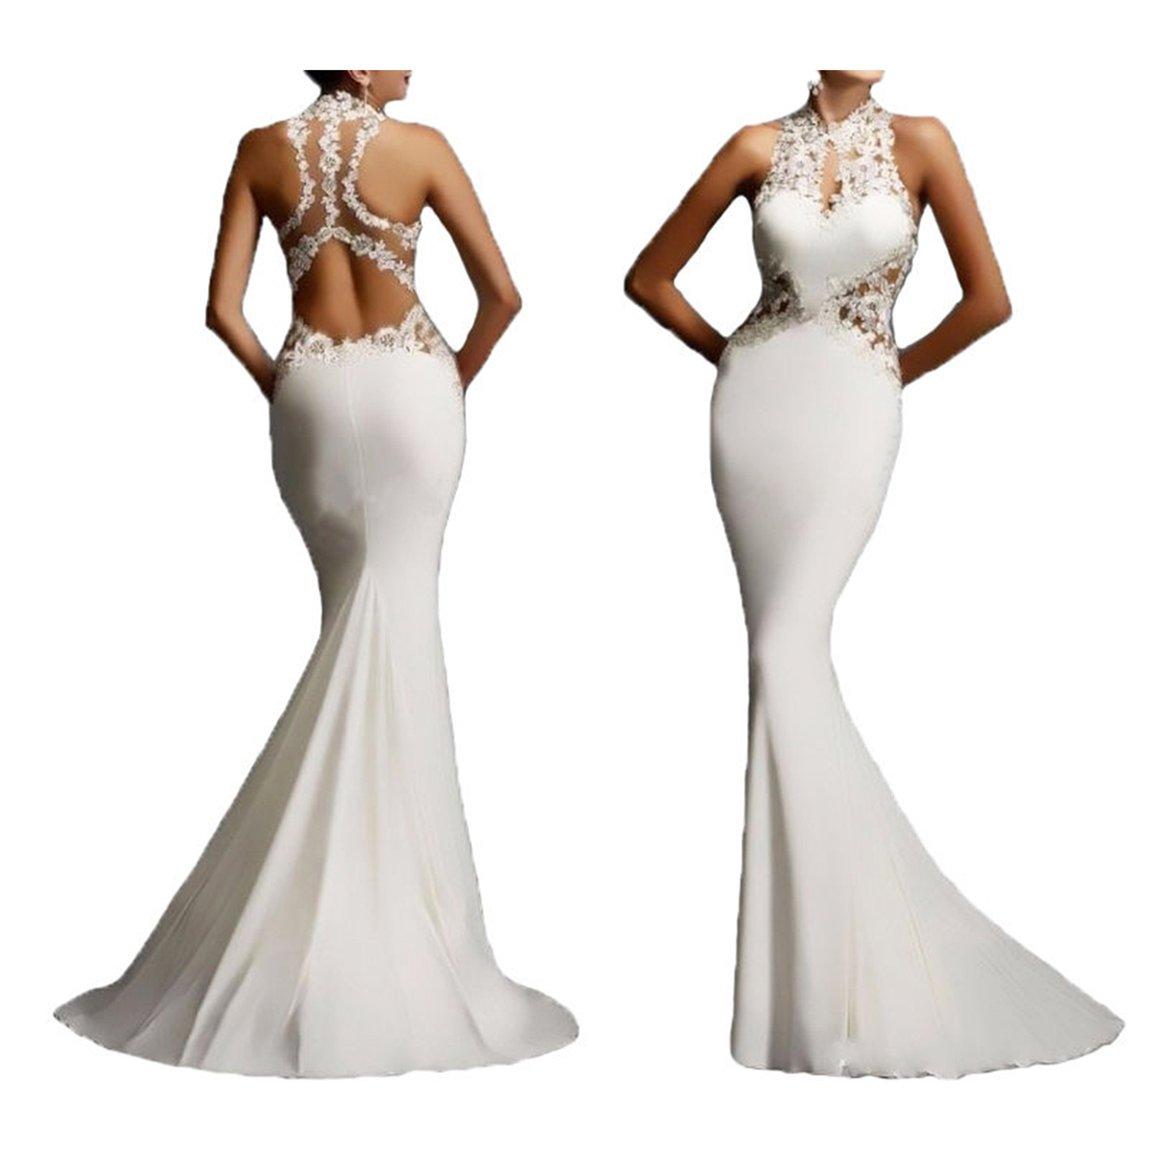 de91fe1d2a0 YSTWLKJ Damen Maxi Etuikleid Spitze Cocktailkleid Abendkleid Meerjungfrau  Paket-Hüfte-Kleid Hockzeitkleid  Amazon.de  Bekleidung